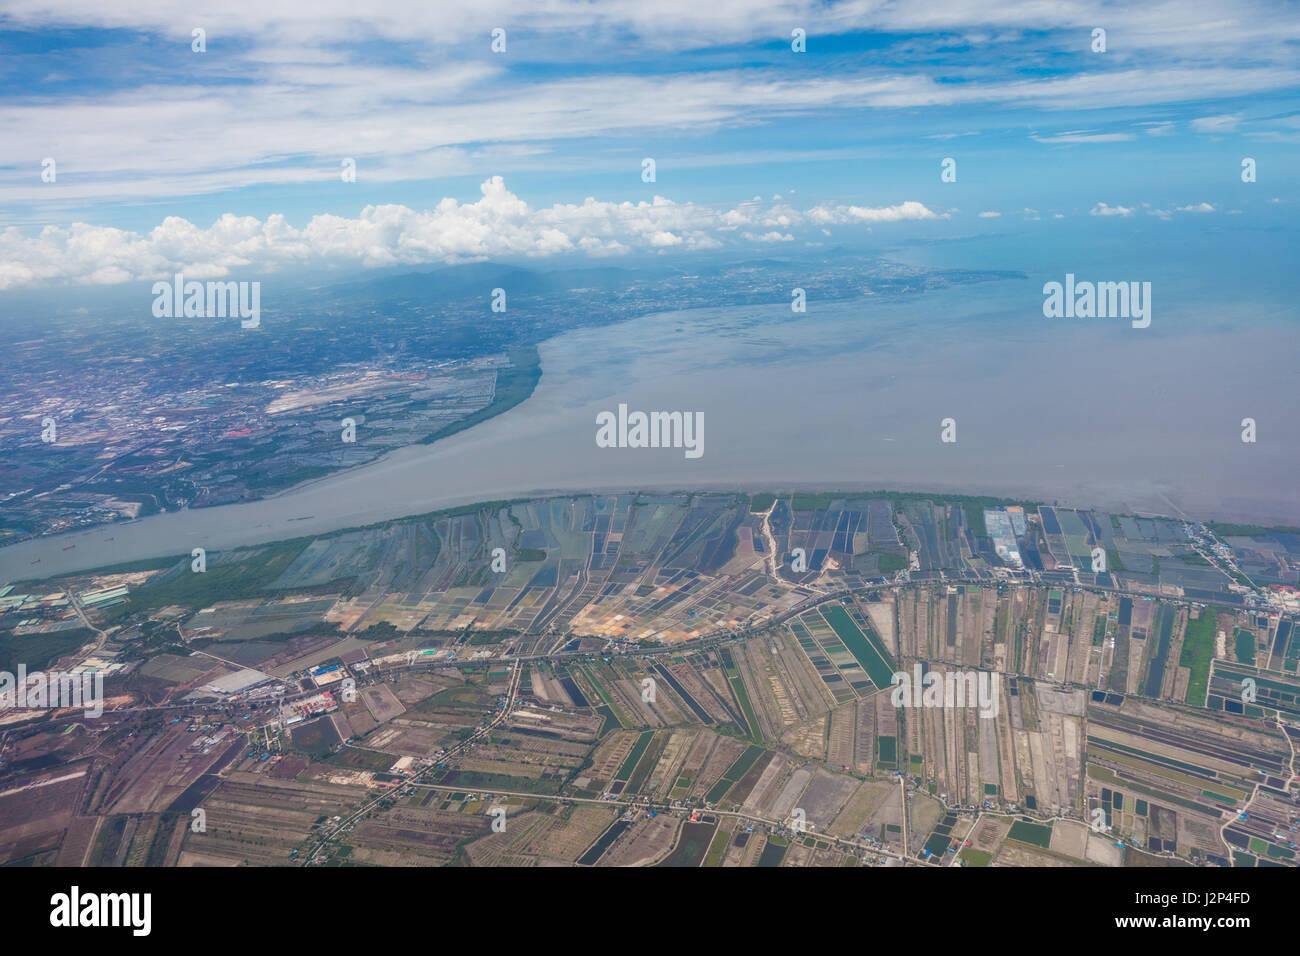 Bangpakong river .Top view from airplane - Stock Image